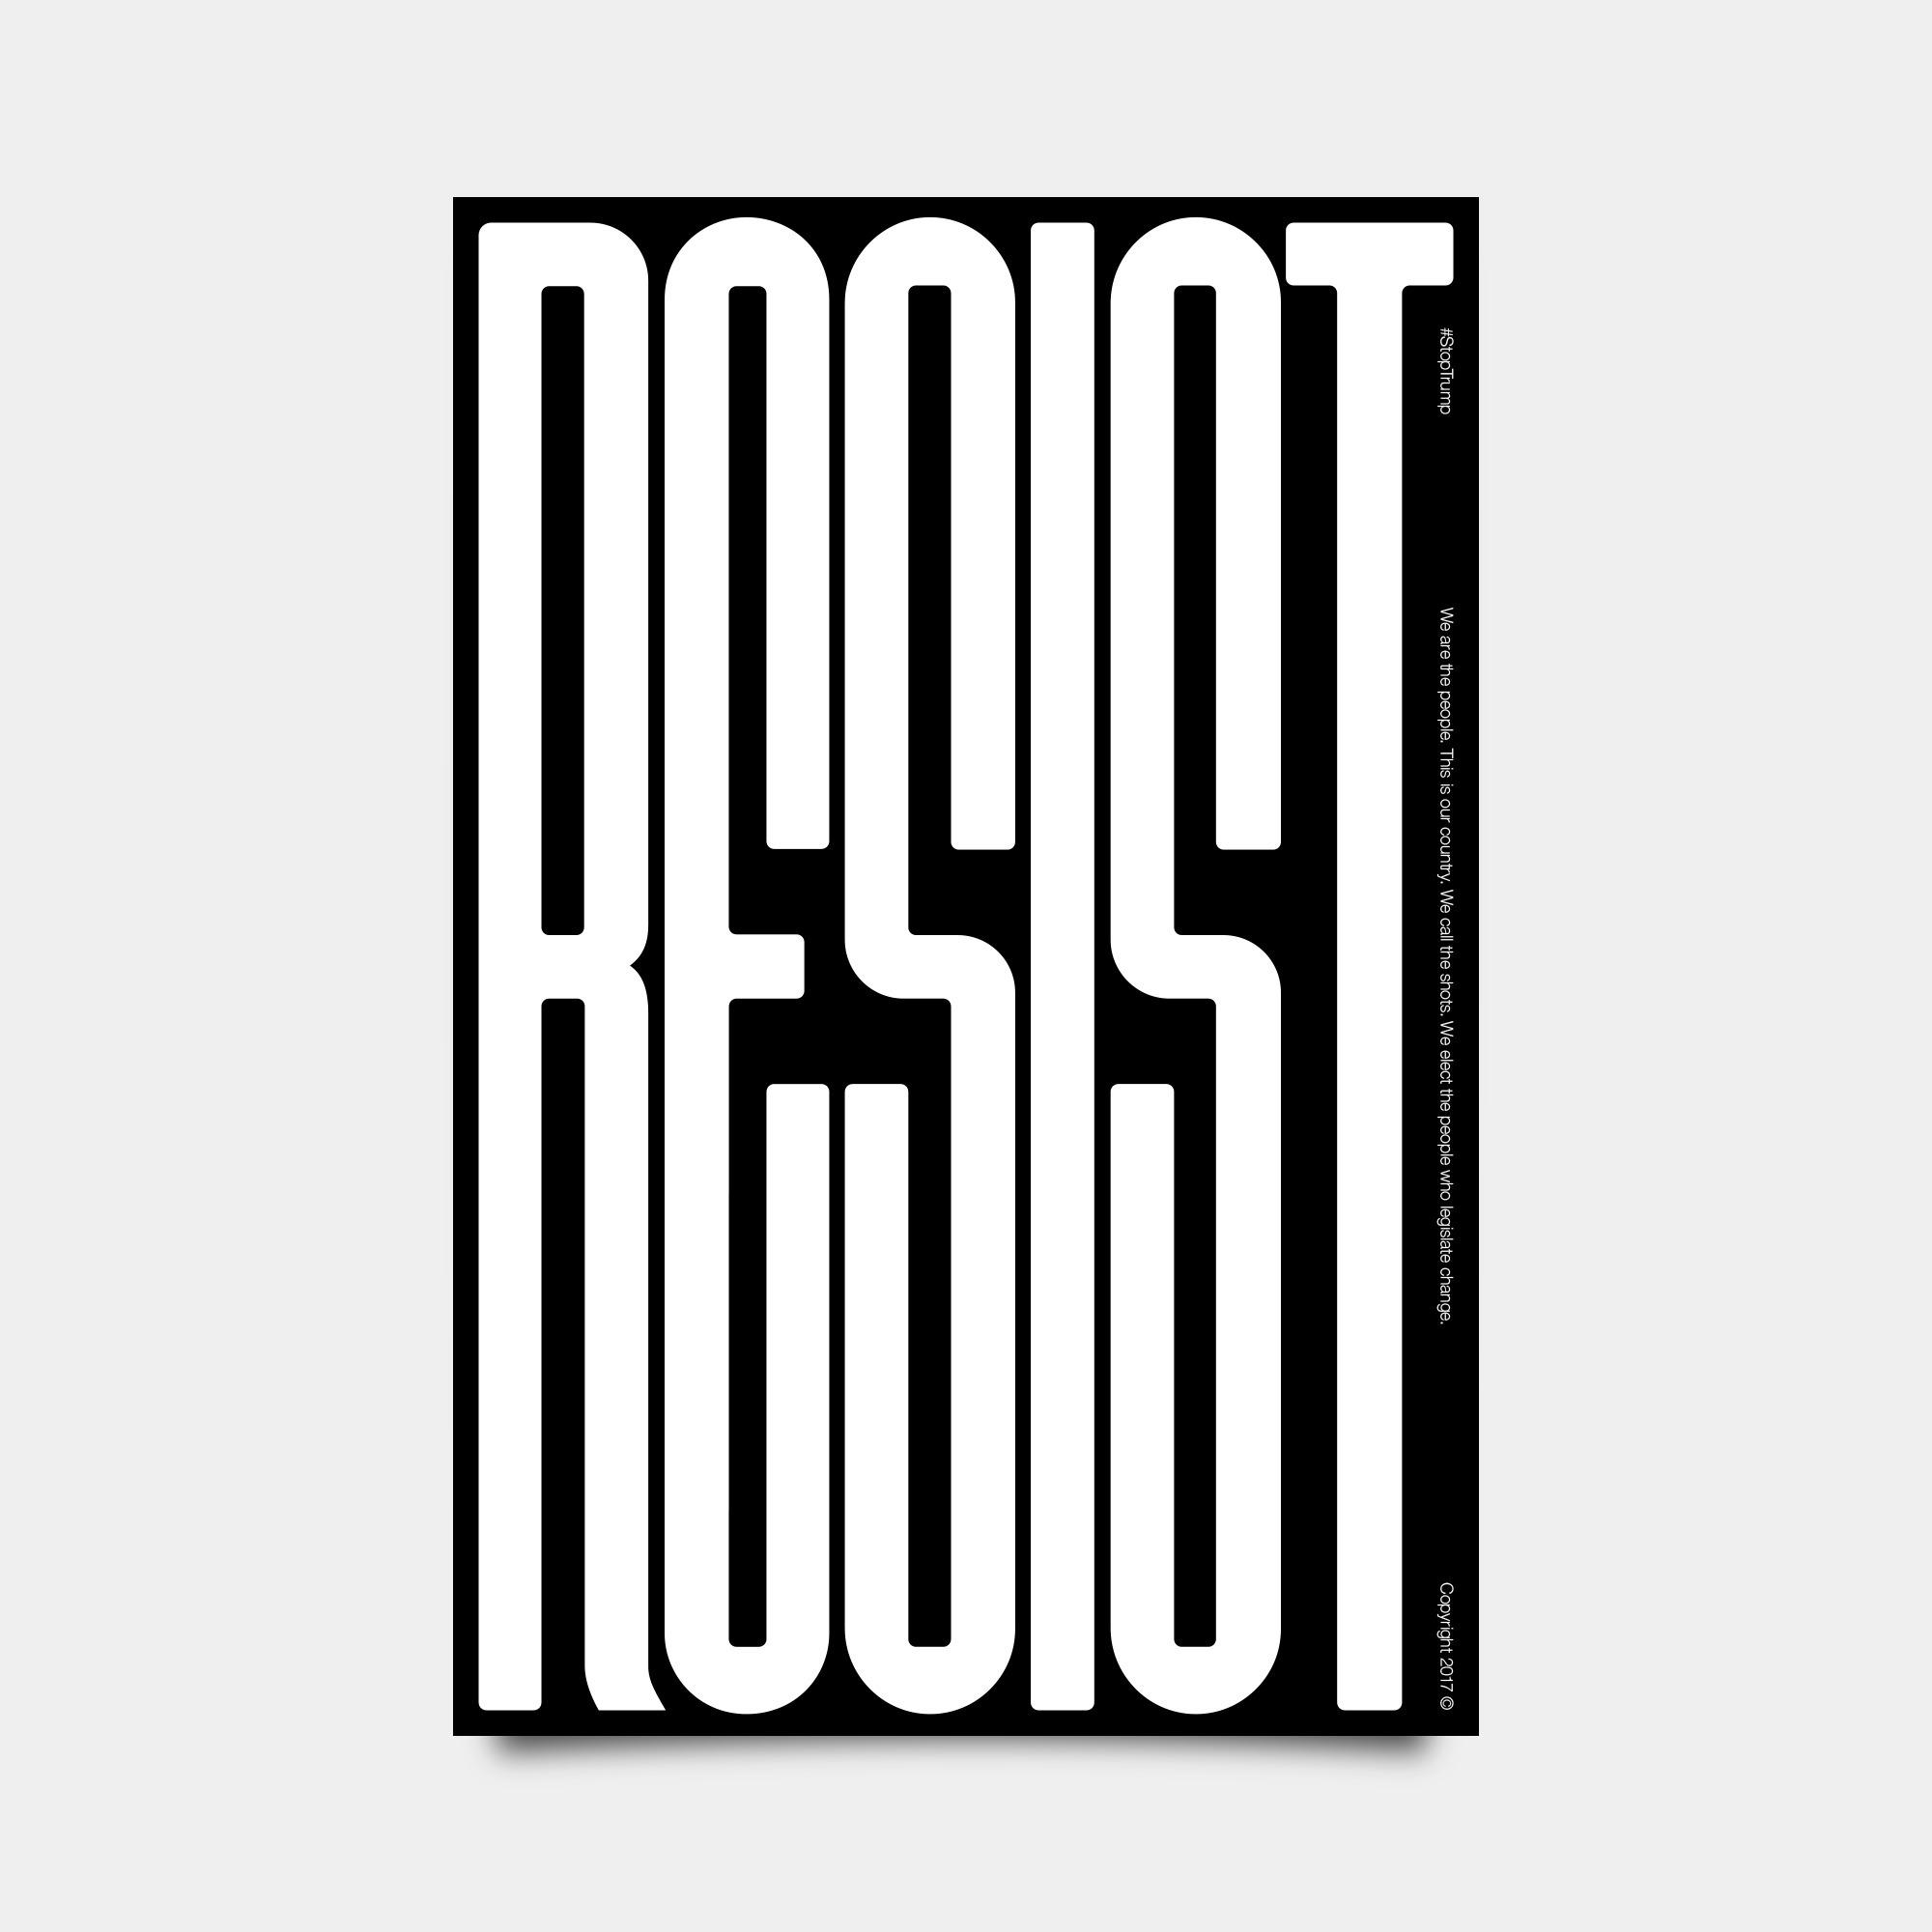 Resist StopTrump - jschachterle | ello